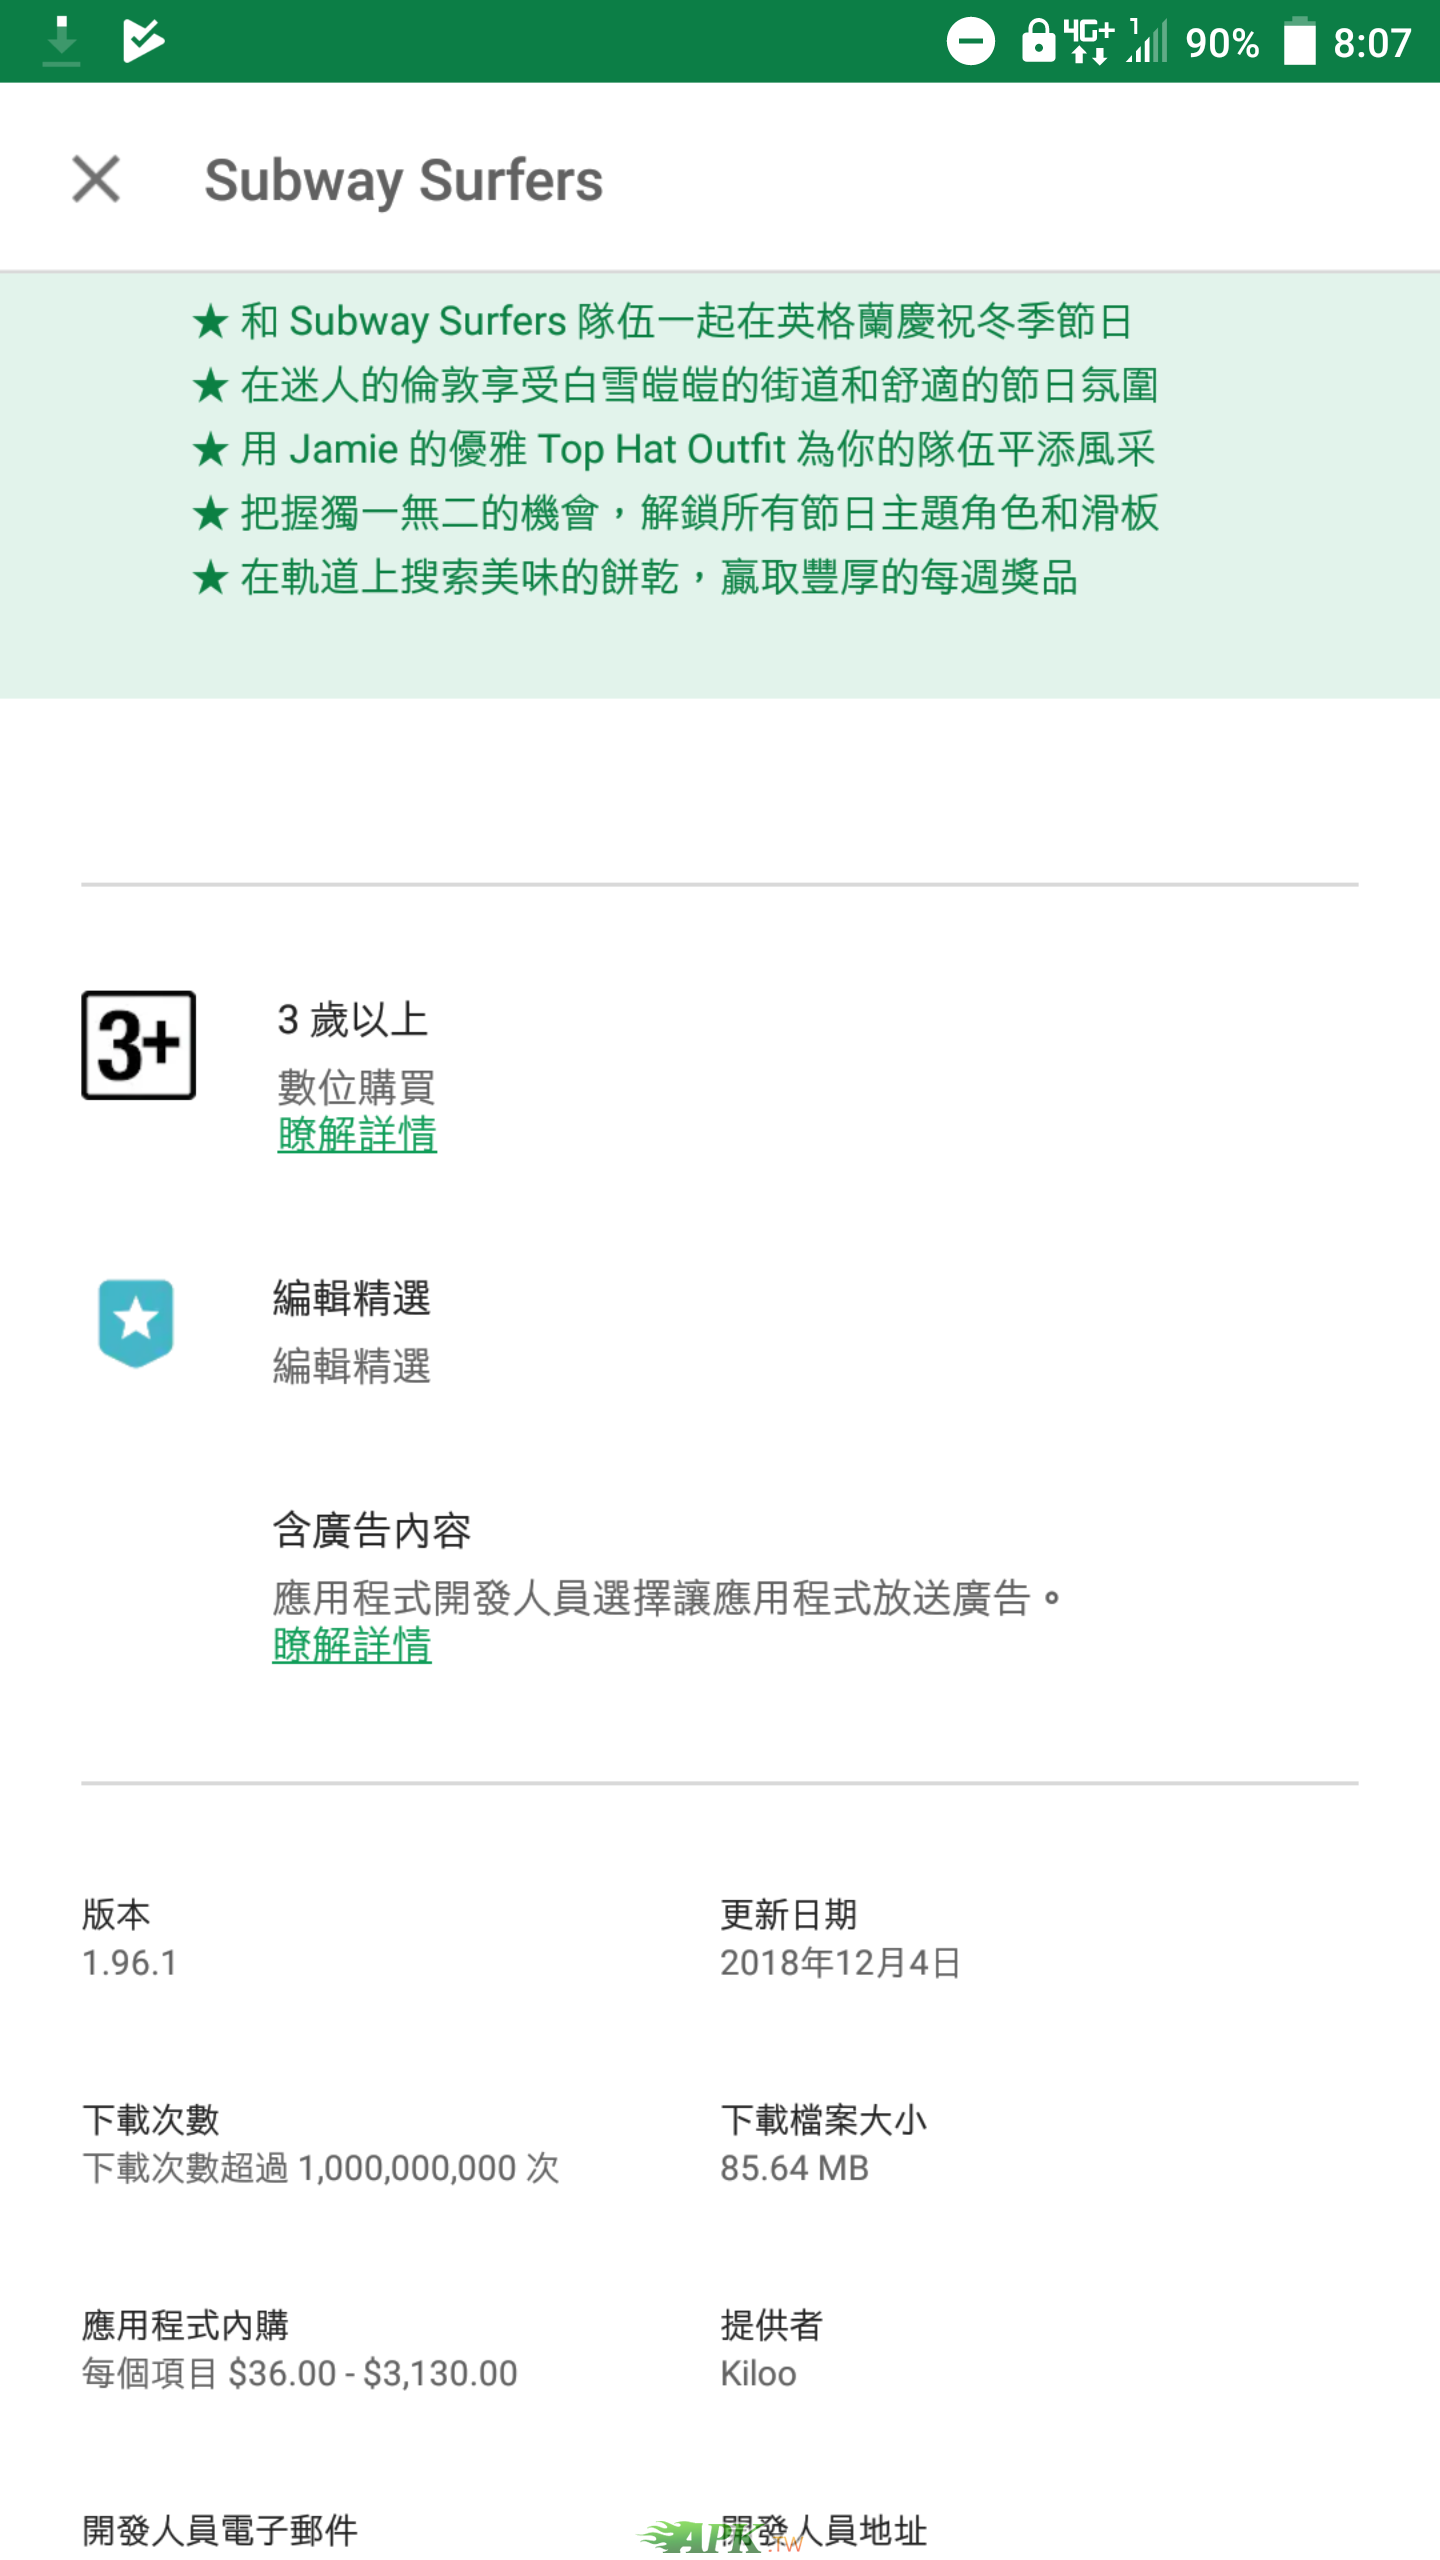 Screenshot_20181206-080724.png